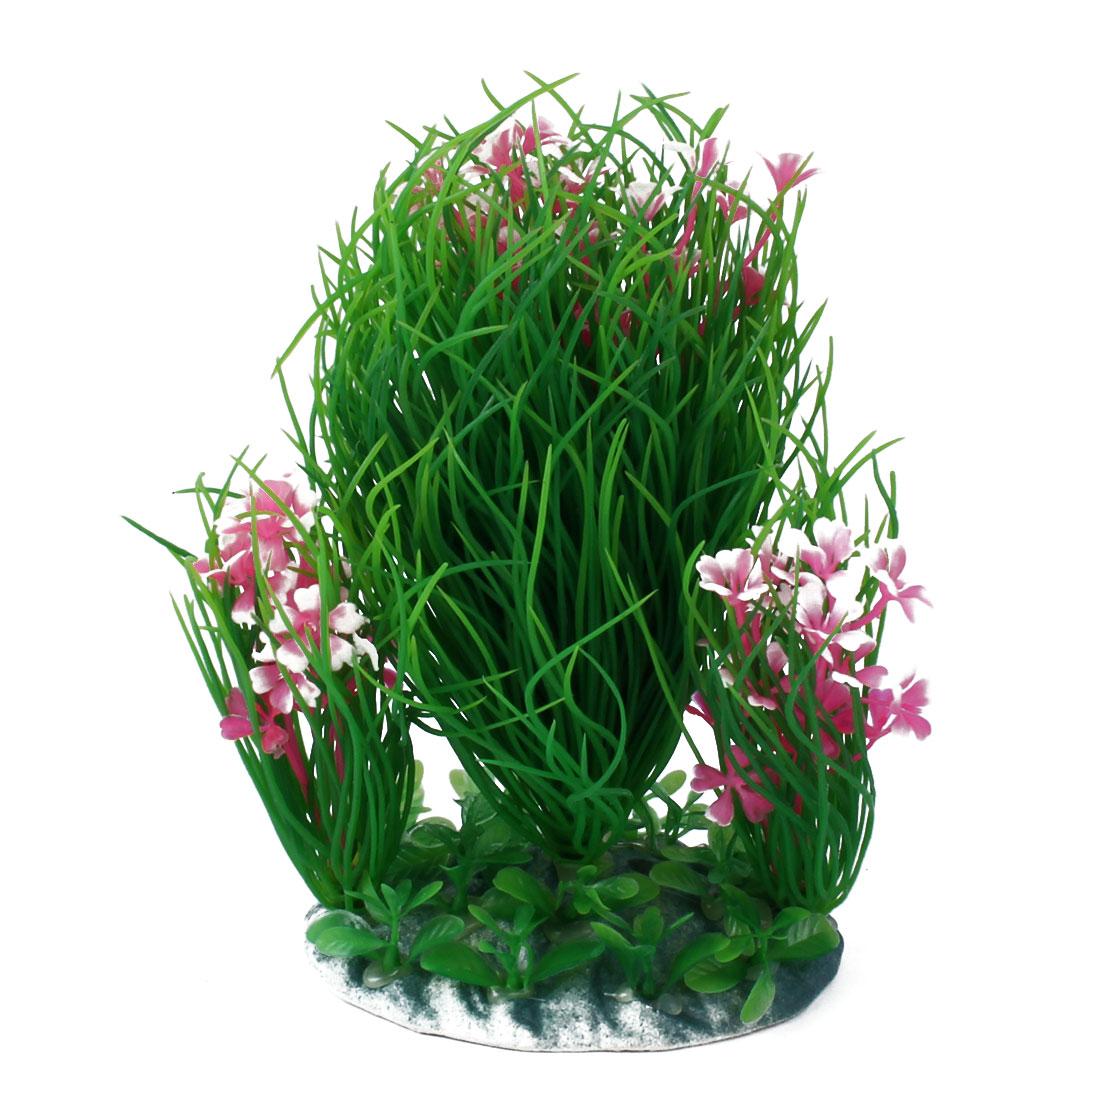 Aquarium Emulational Artificial Underwater Grass Flower Plant Decor Green Pink 19cm Height